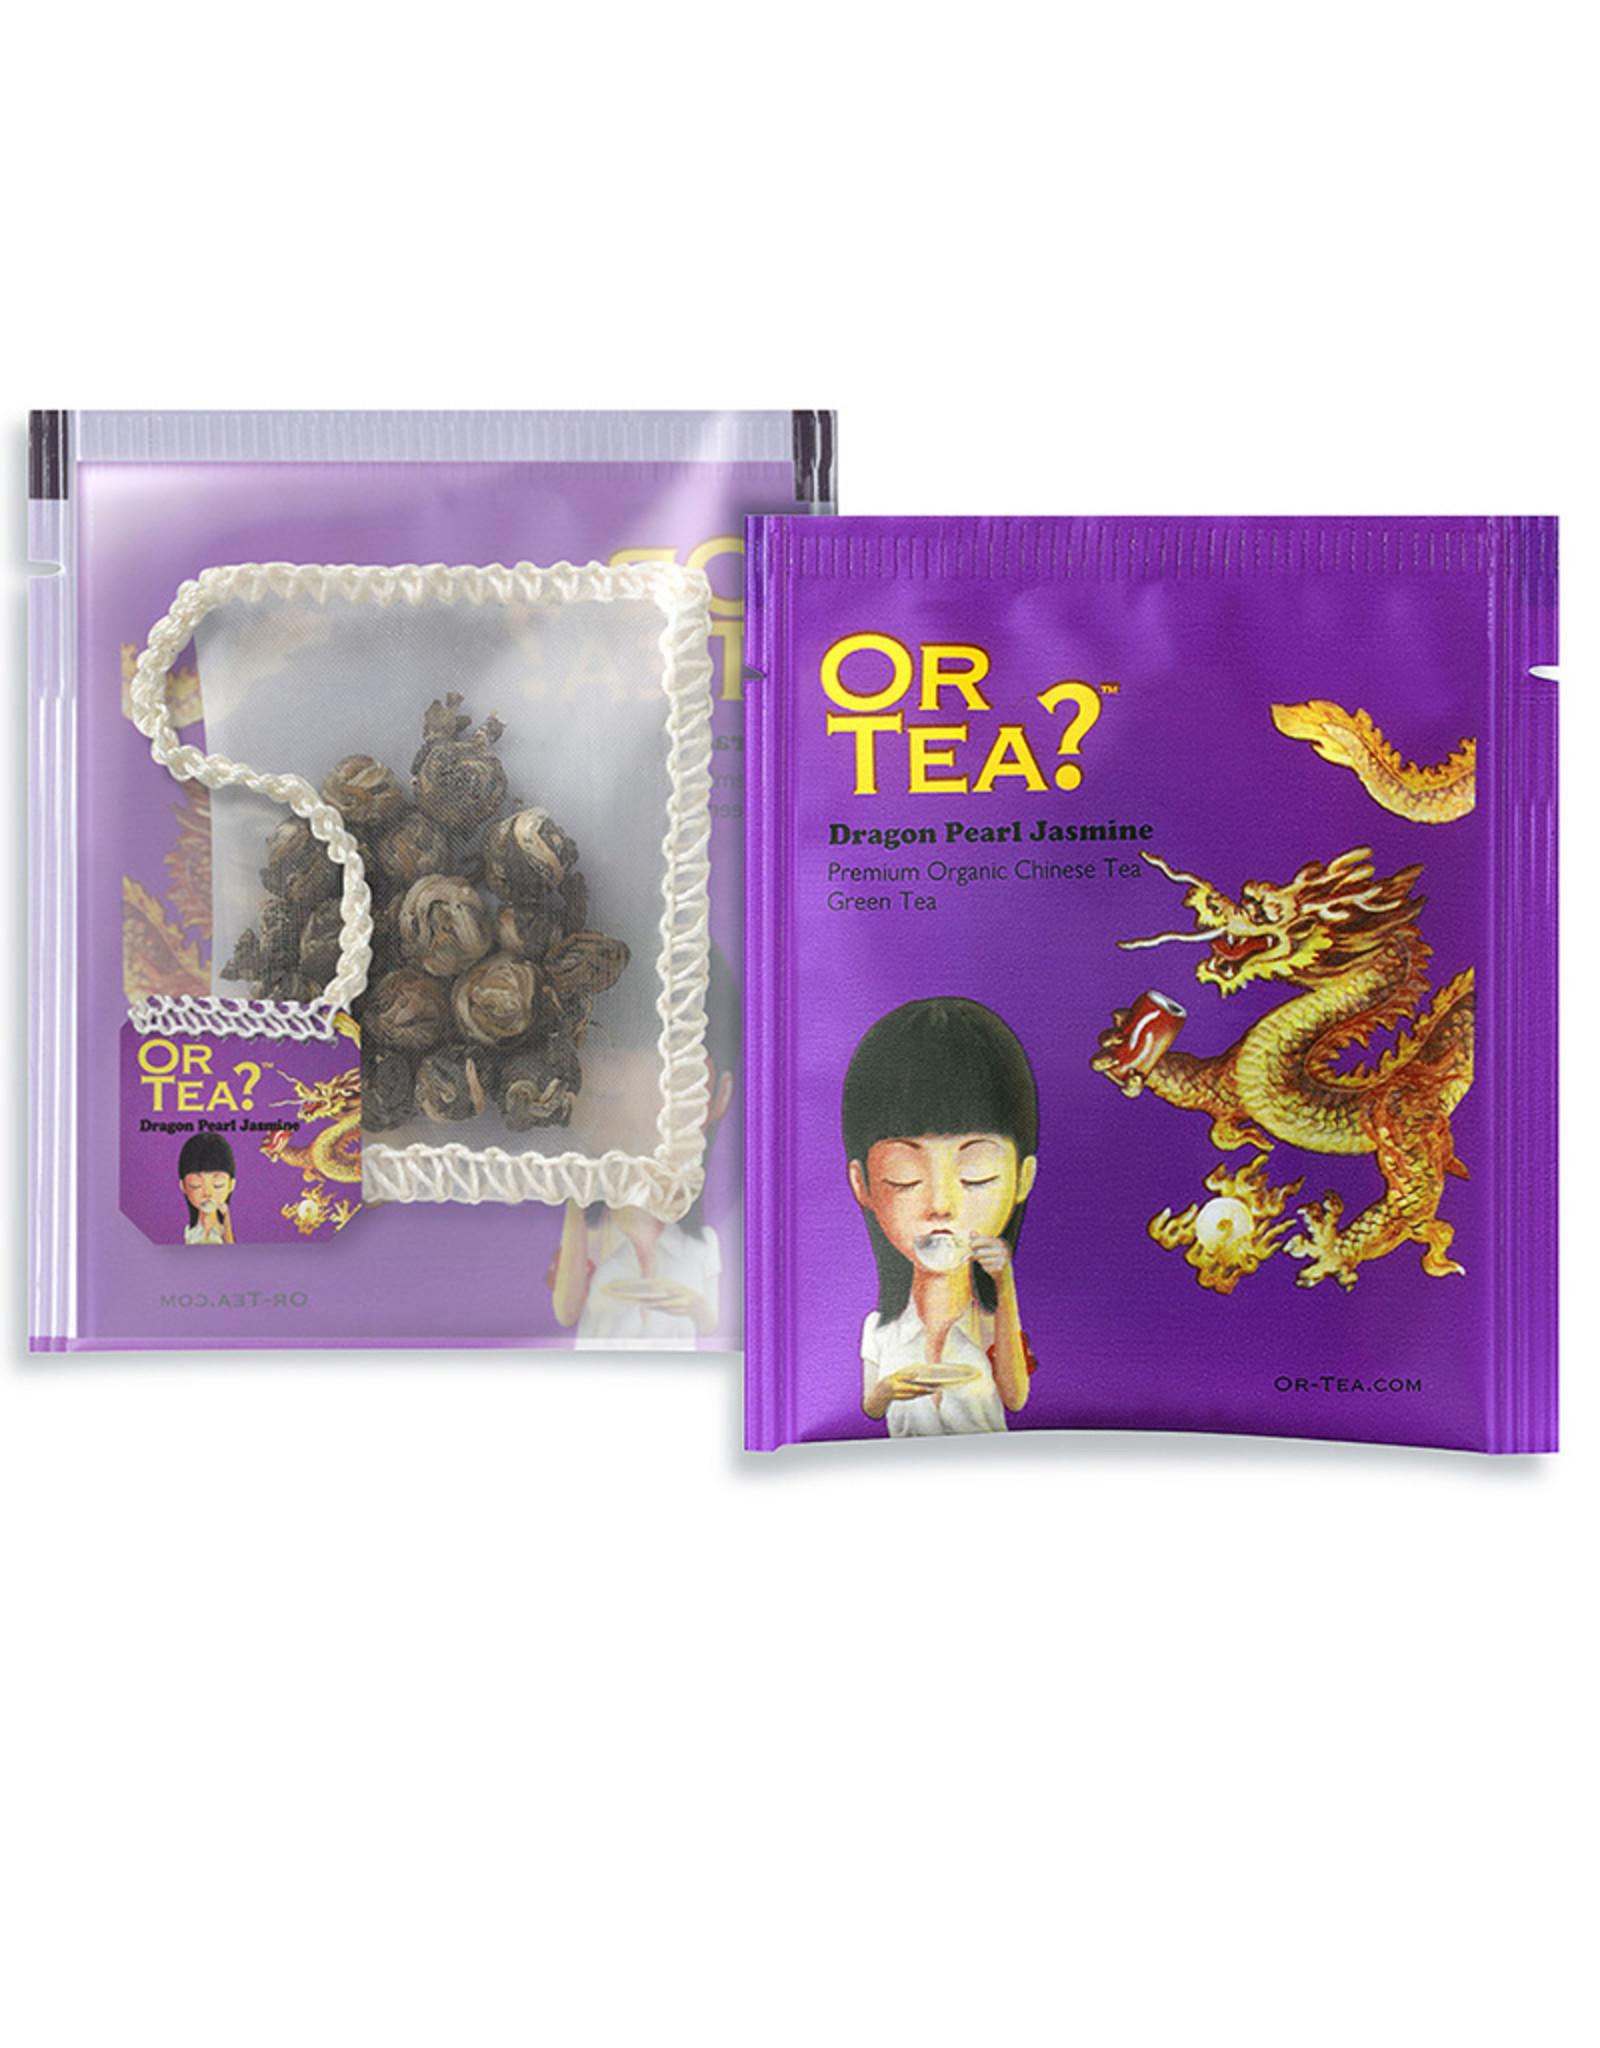 Or Tea? Dragon Pearl Jasmine - Groene thee met jasmijn aroma